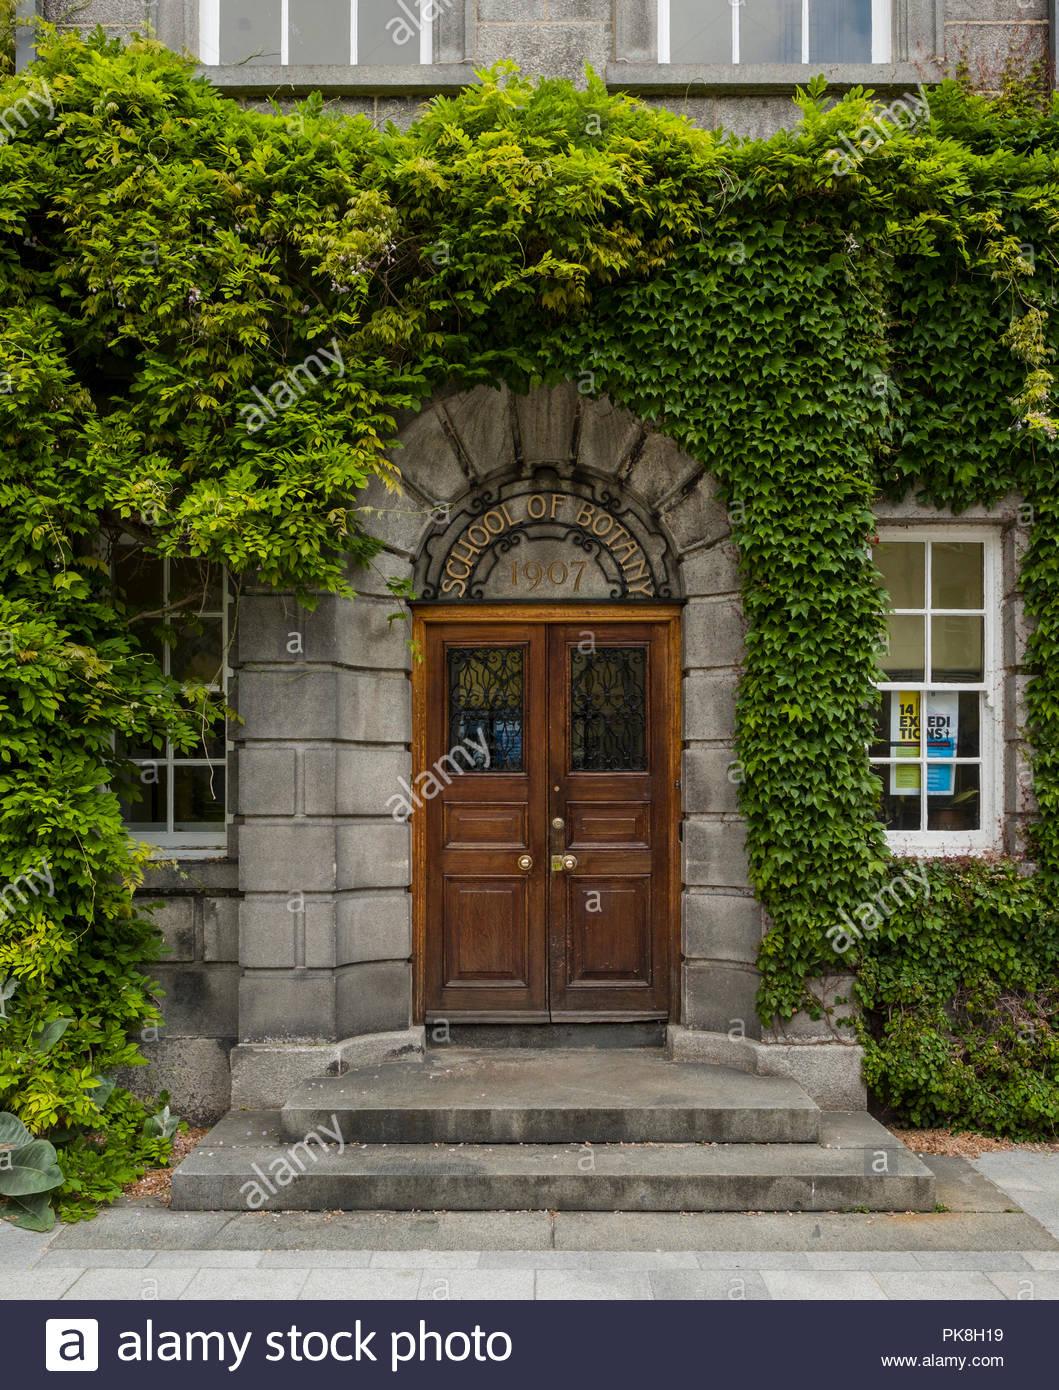 School of Botany, Trinity College, Dublin, Leinster, Ireland - Stock Image